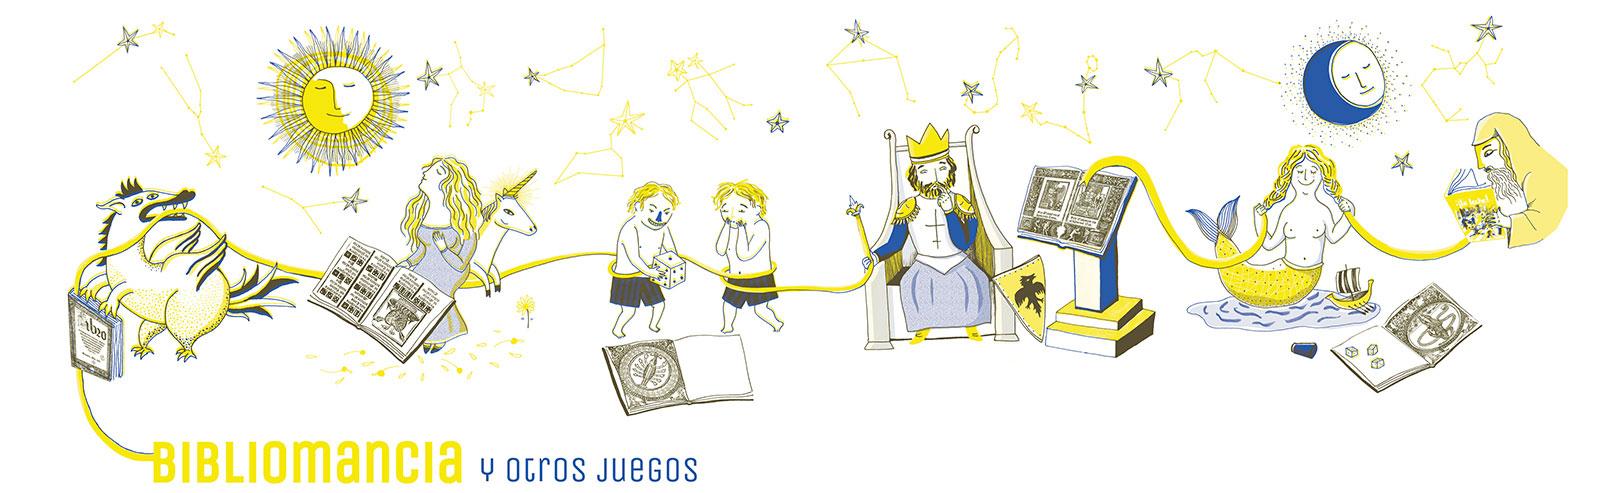 Alejandra Fernández ilustradora ¡La leche!